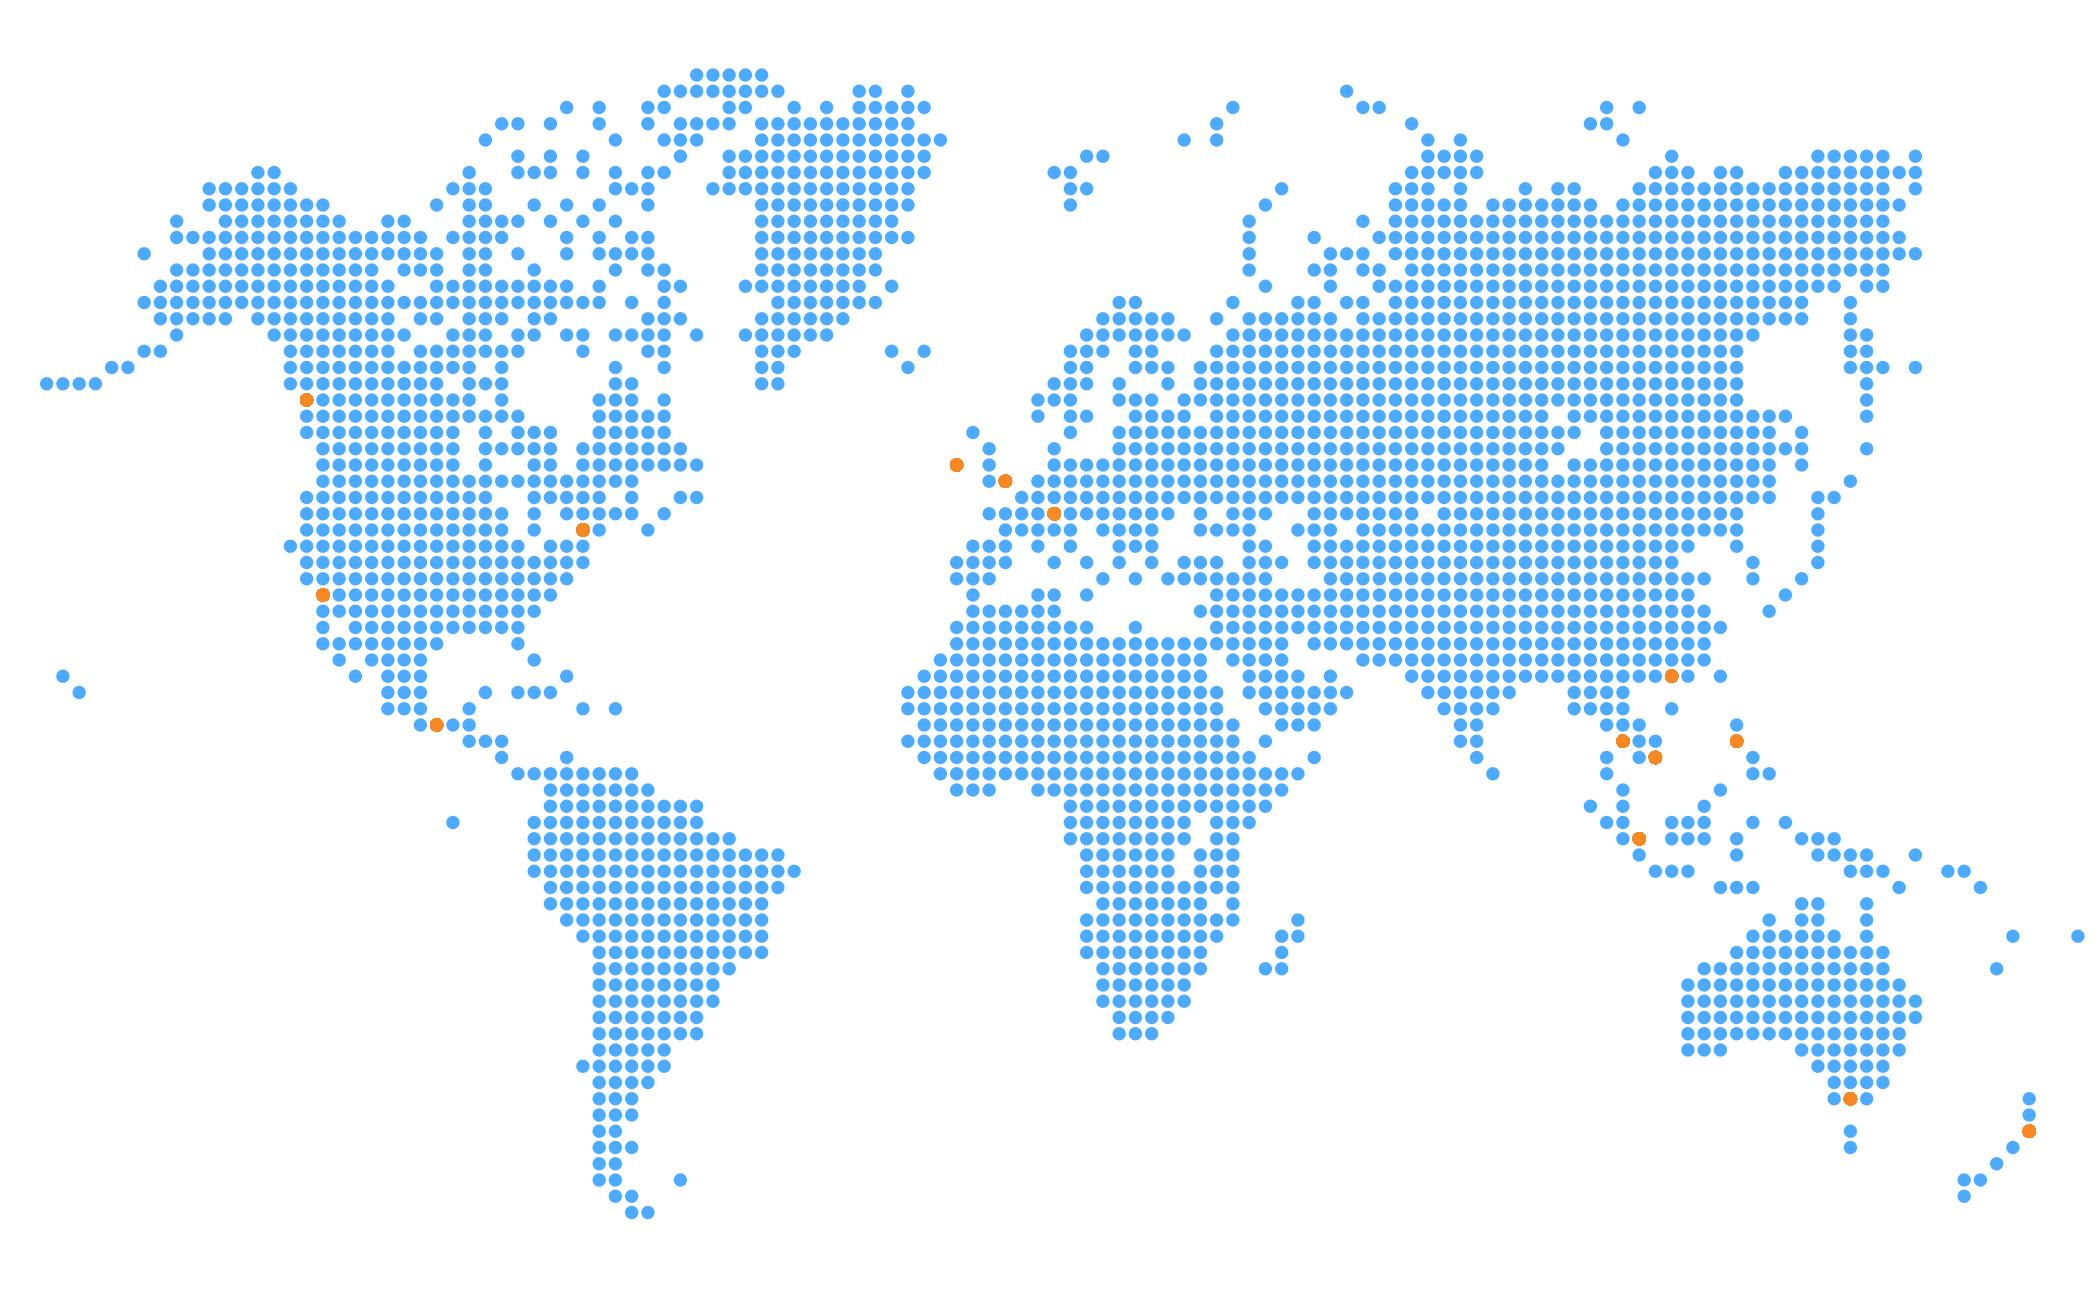 zo-map-20180408